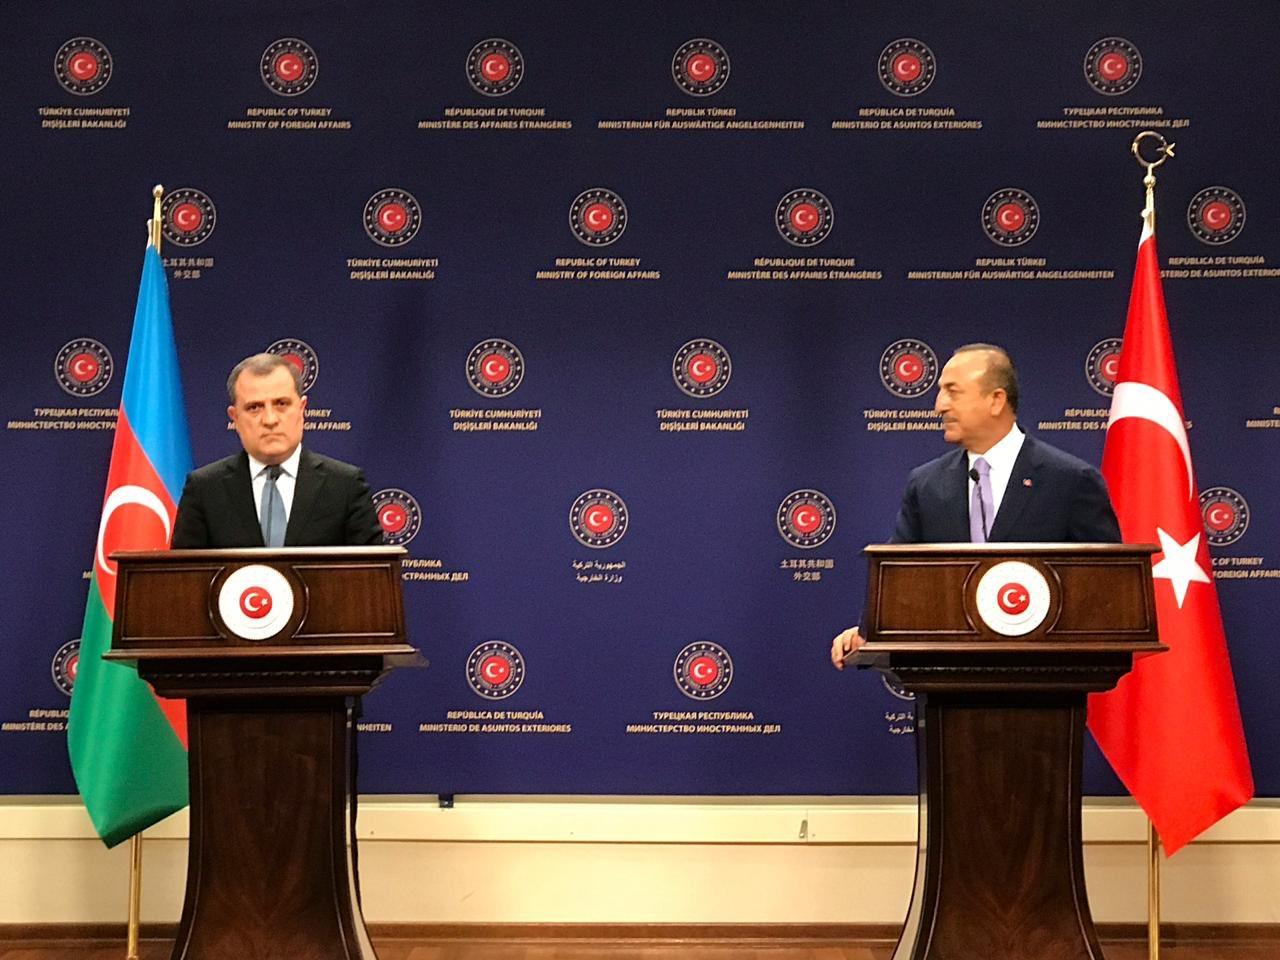 Джейхун Байрамов: Позиция Азербайджана по нагорно-карабахскому конфликту неизменна - ВИДЕО